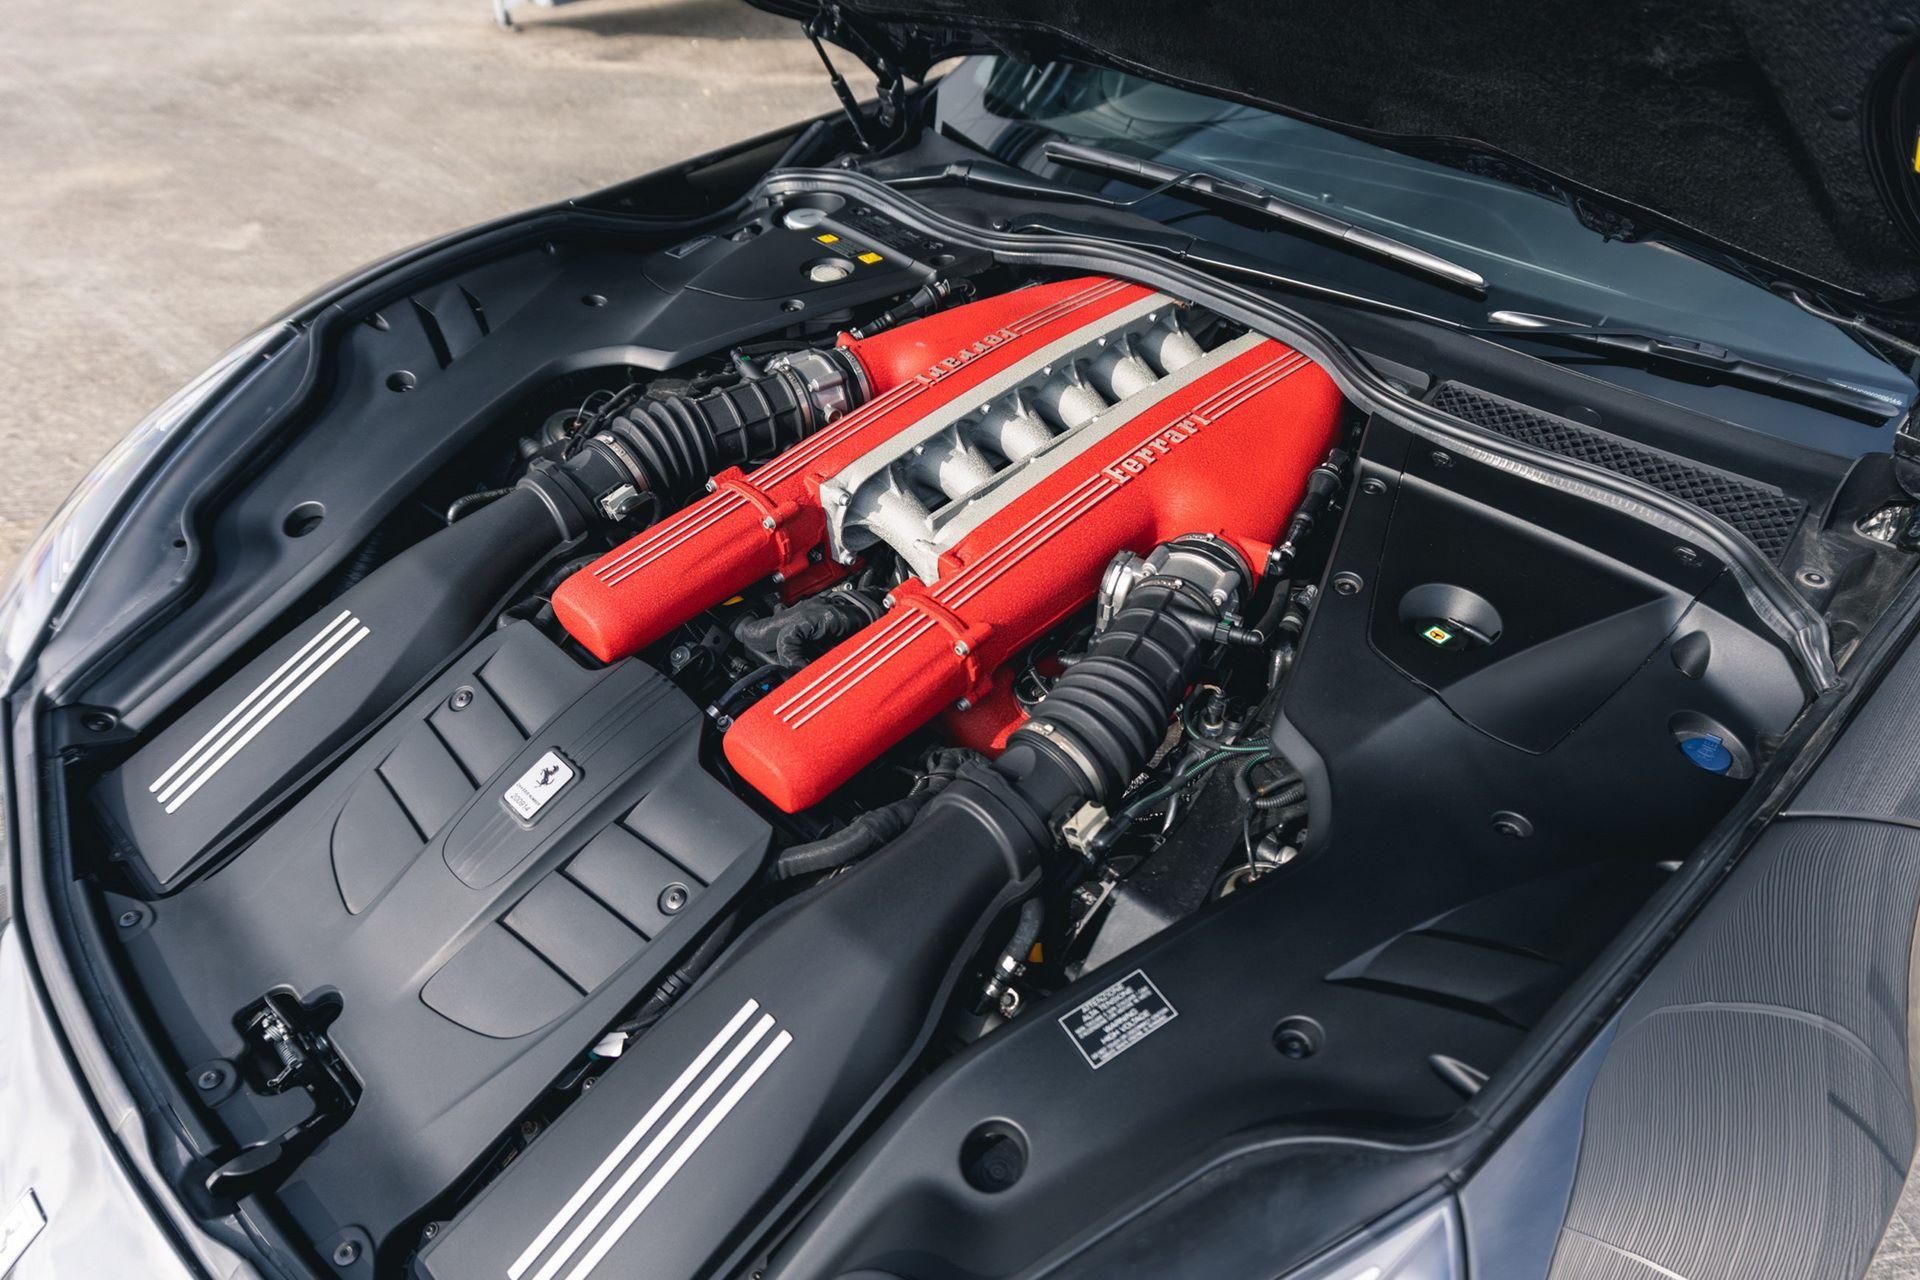 Ferrari-F12berlinetta-Chris-Harris-17